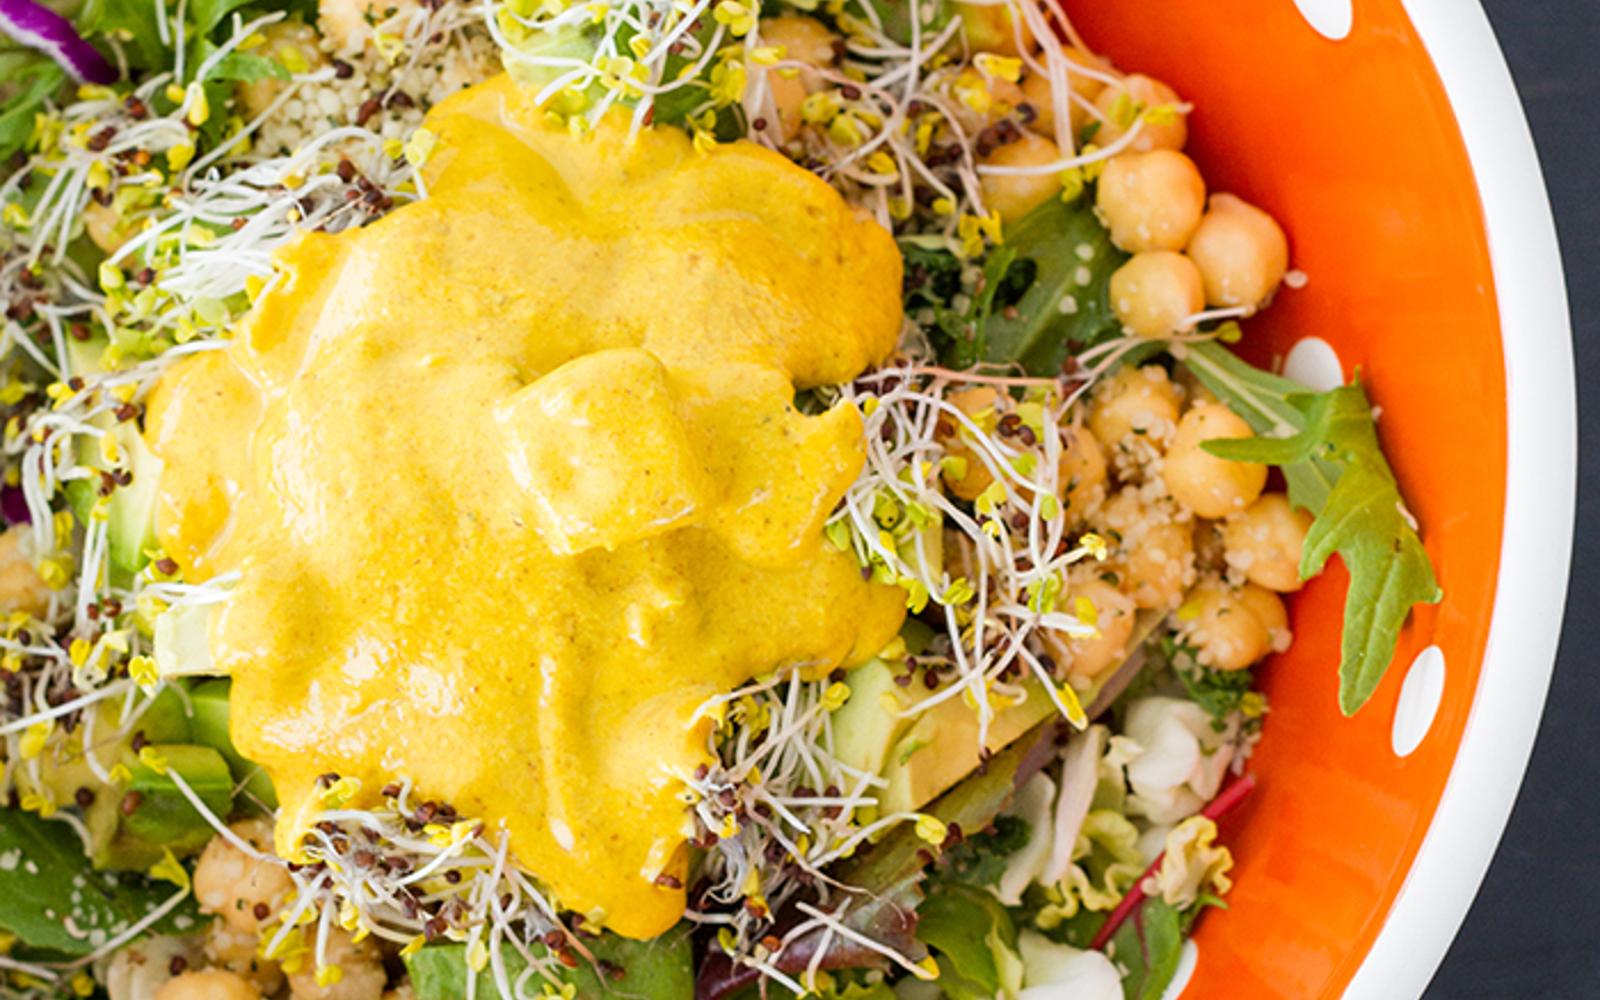 Vegan Almond Butter Turmeric Dressing over salad